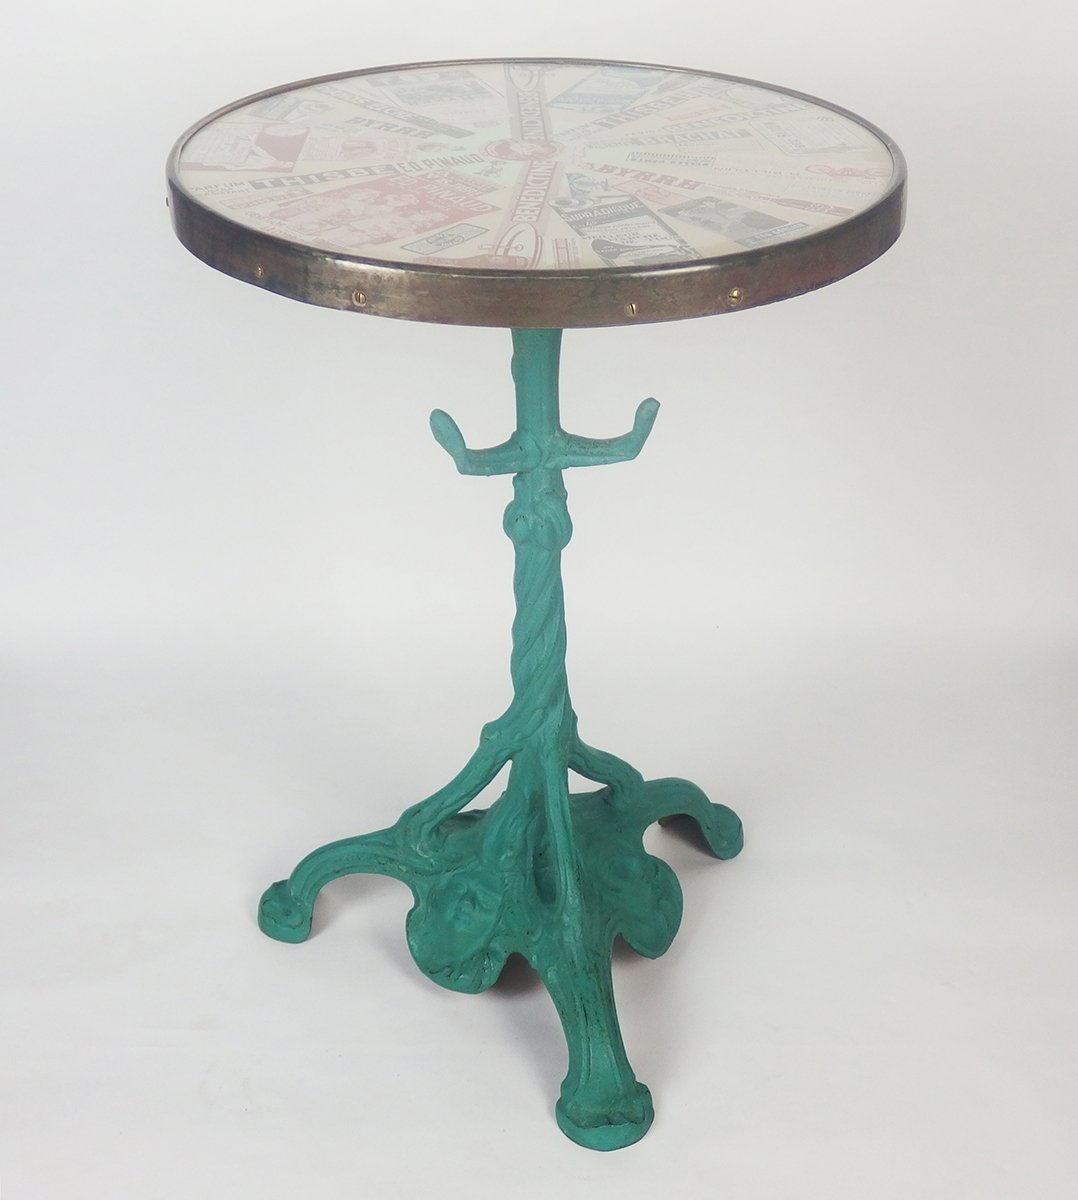 table bistrot antique avec plateau en verre france en vente sur pamono. Black Bedroom Furniture Sets. Home Design Ideas